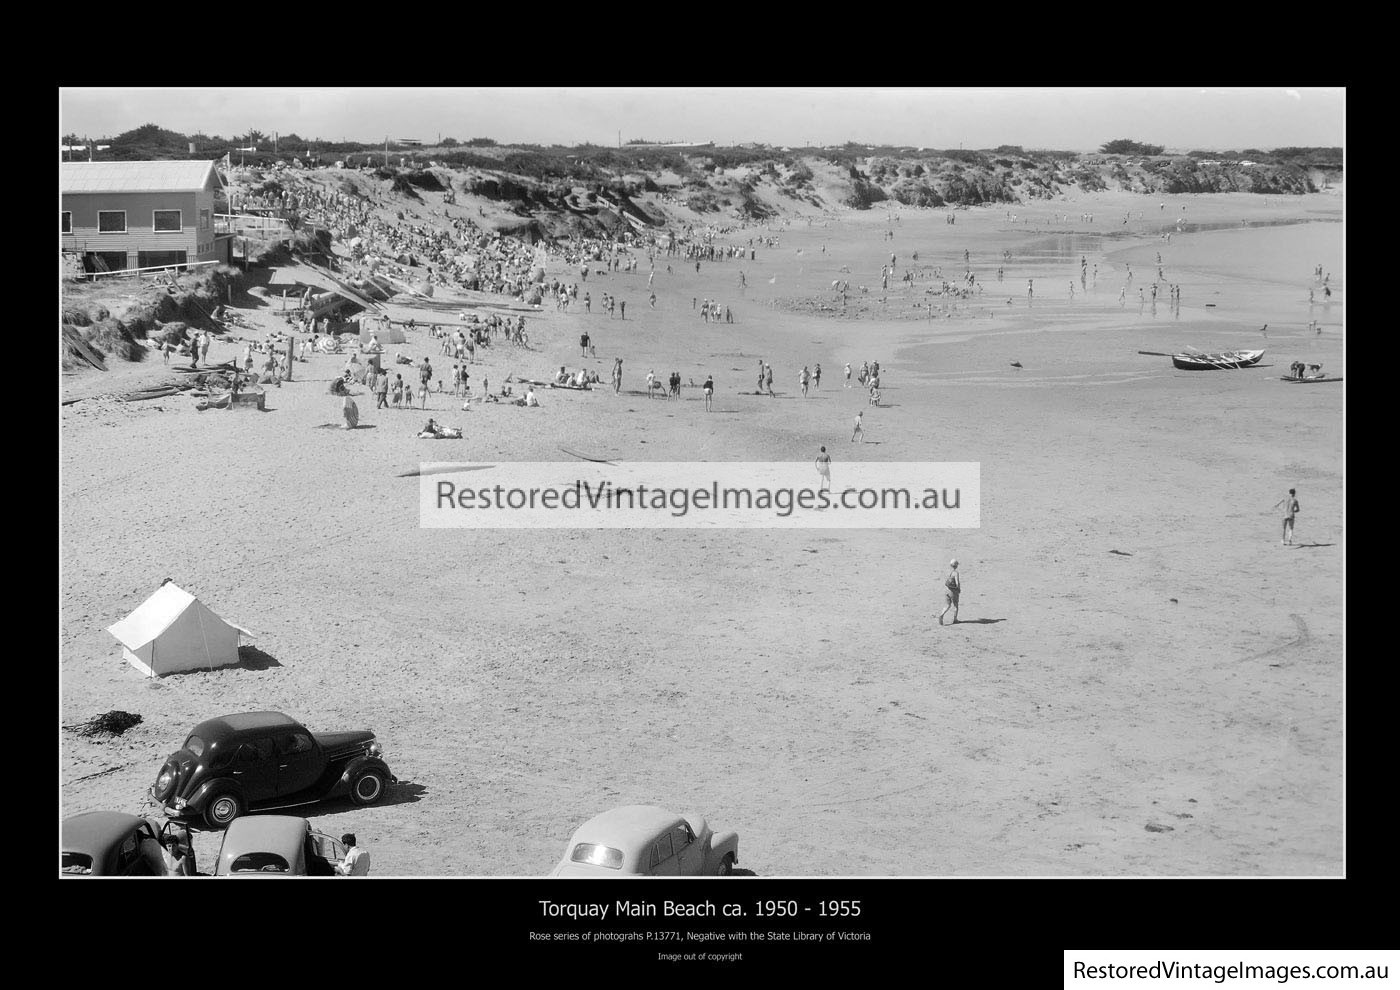 Main Surfing Beach Torquay 1920s